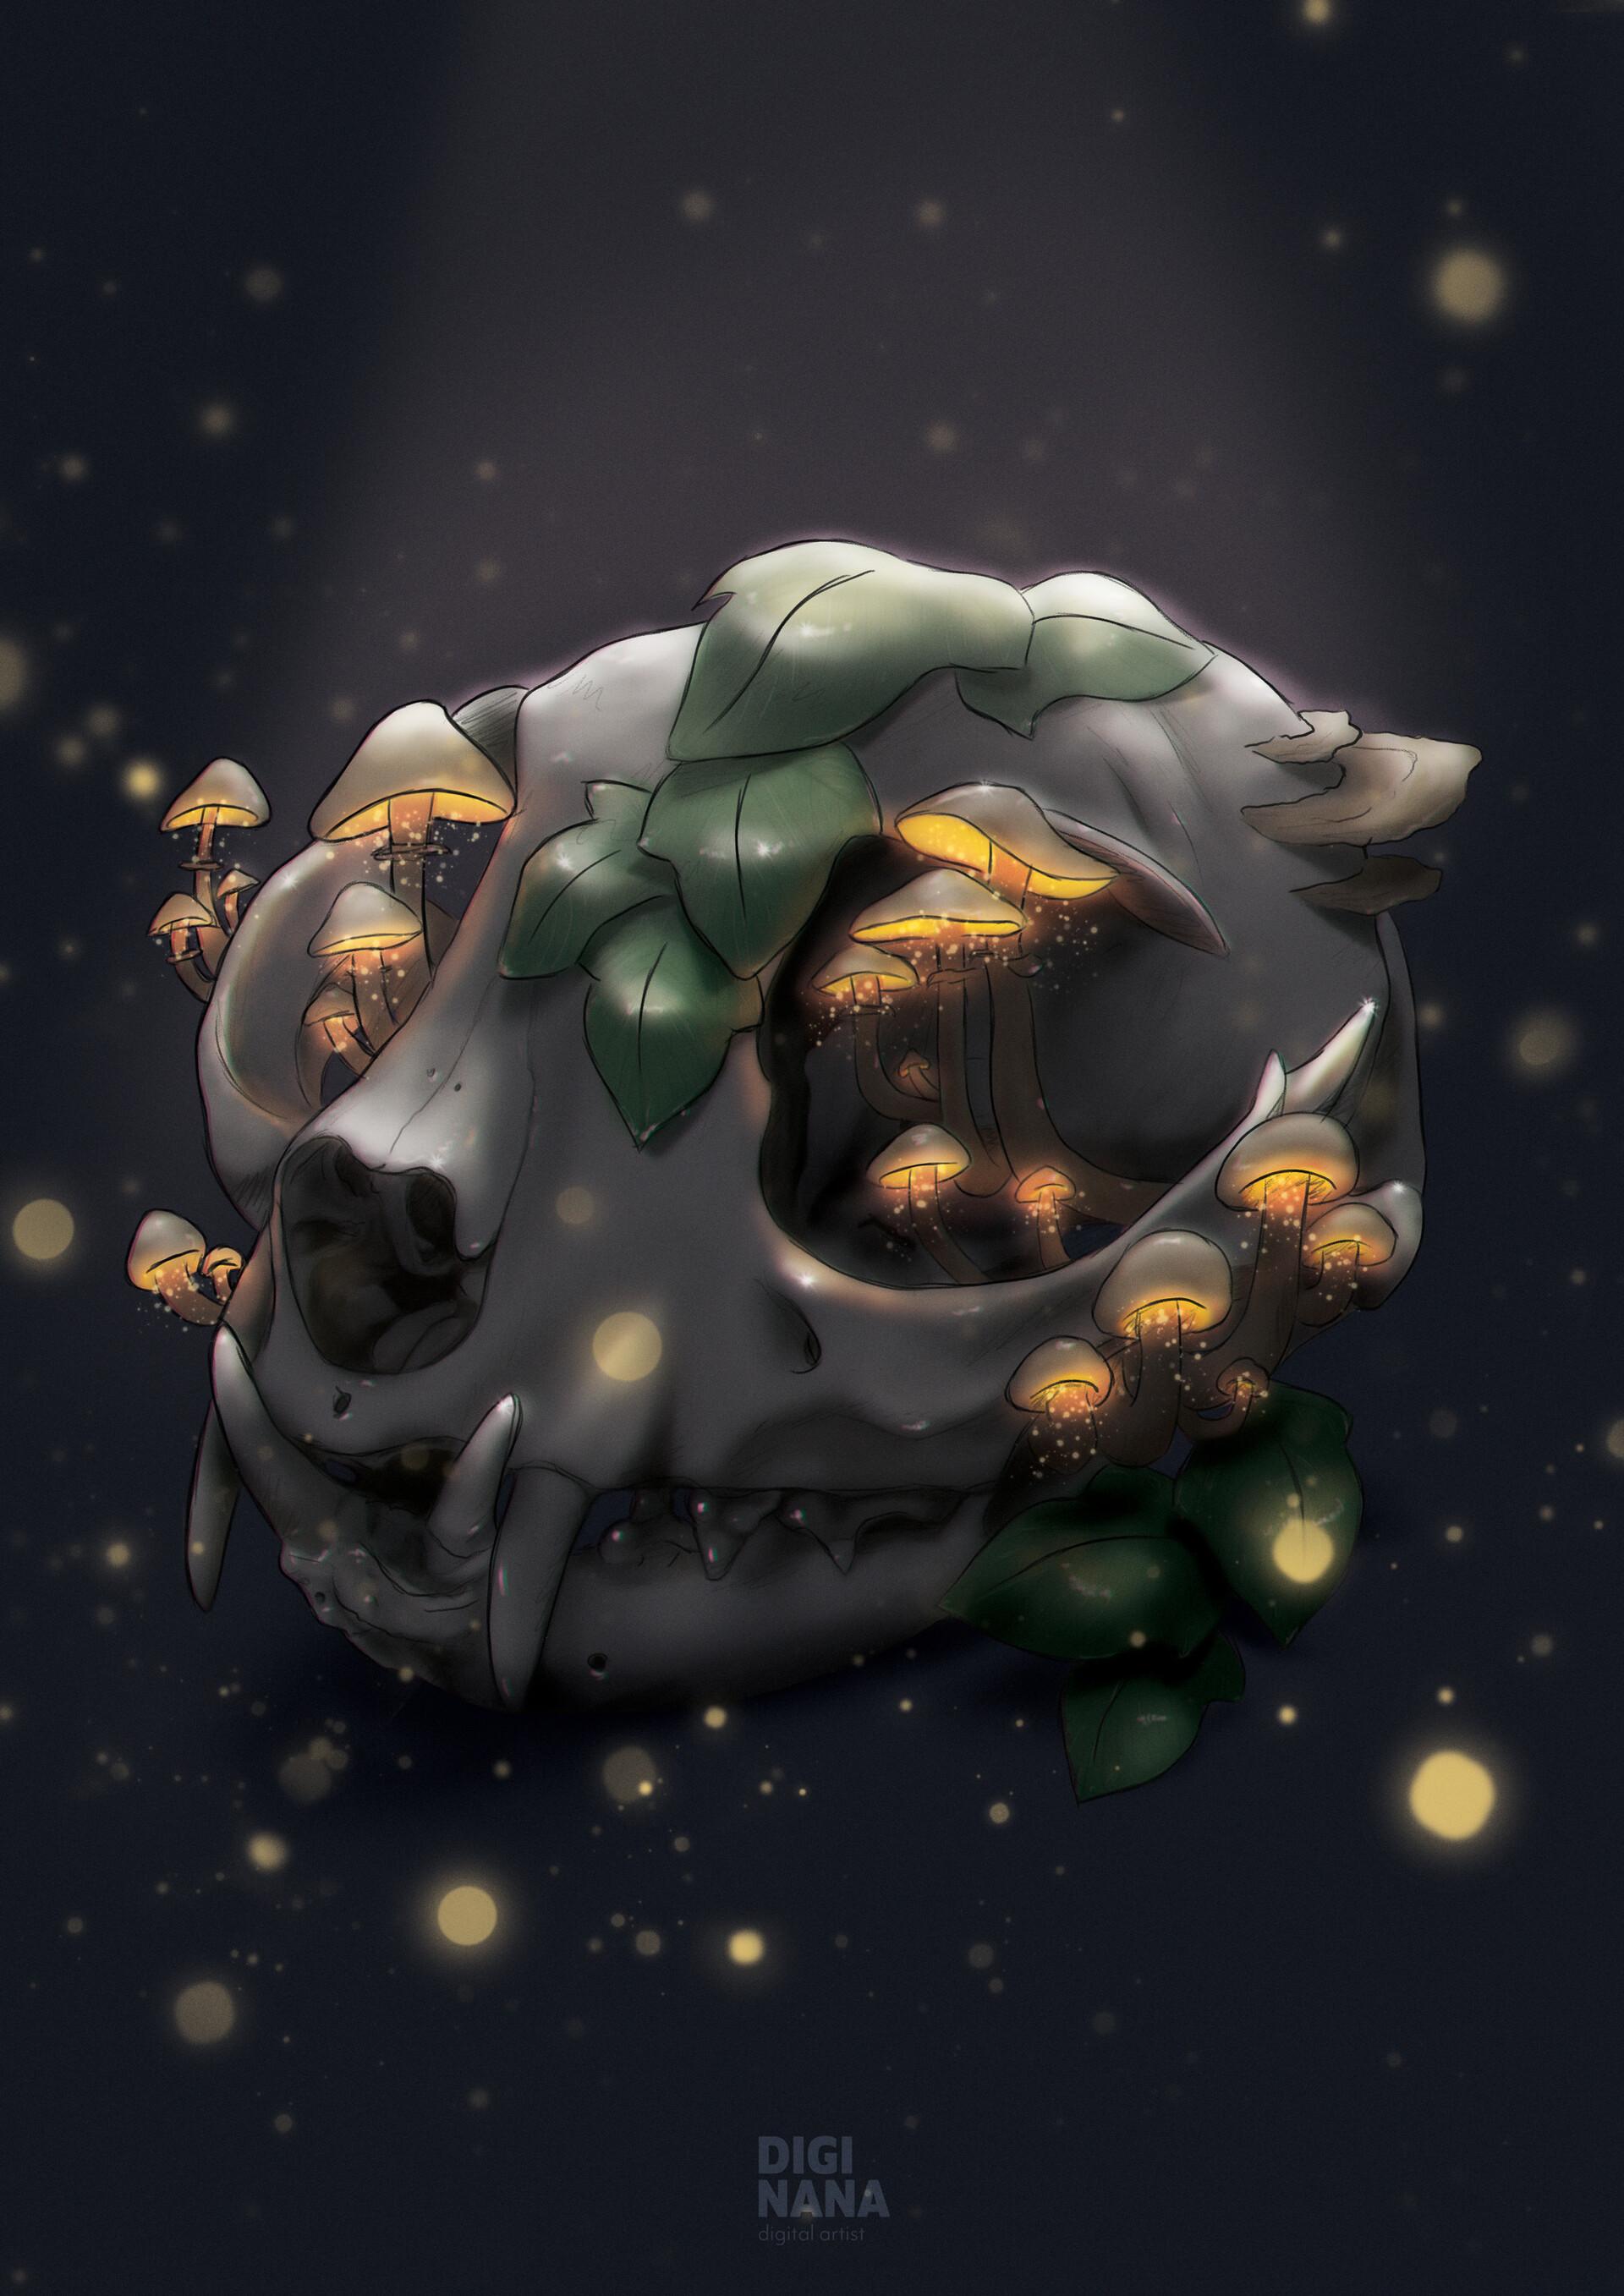 Digi nana cat skull